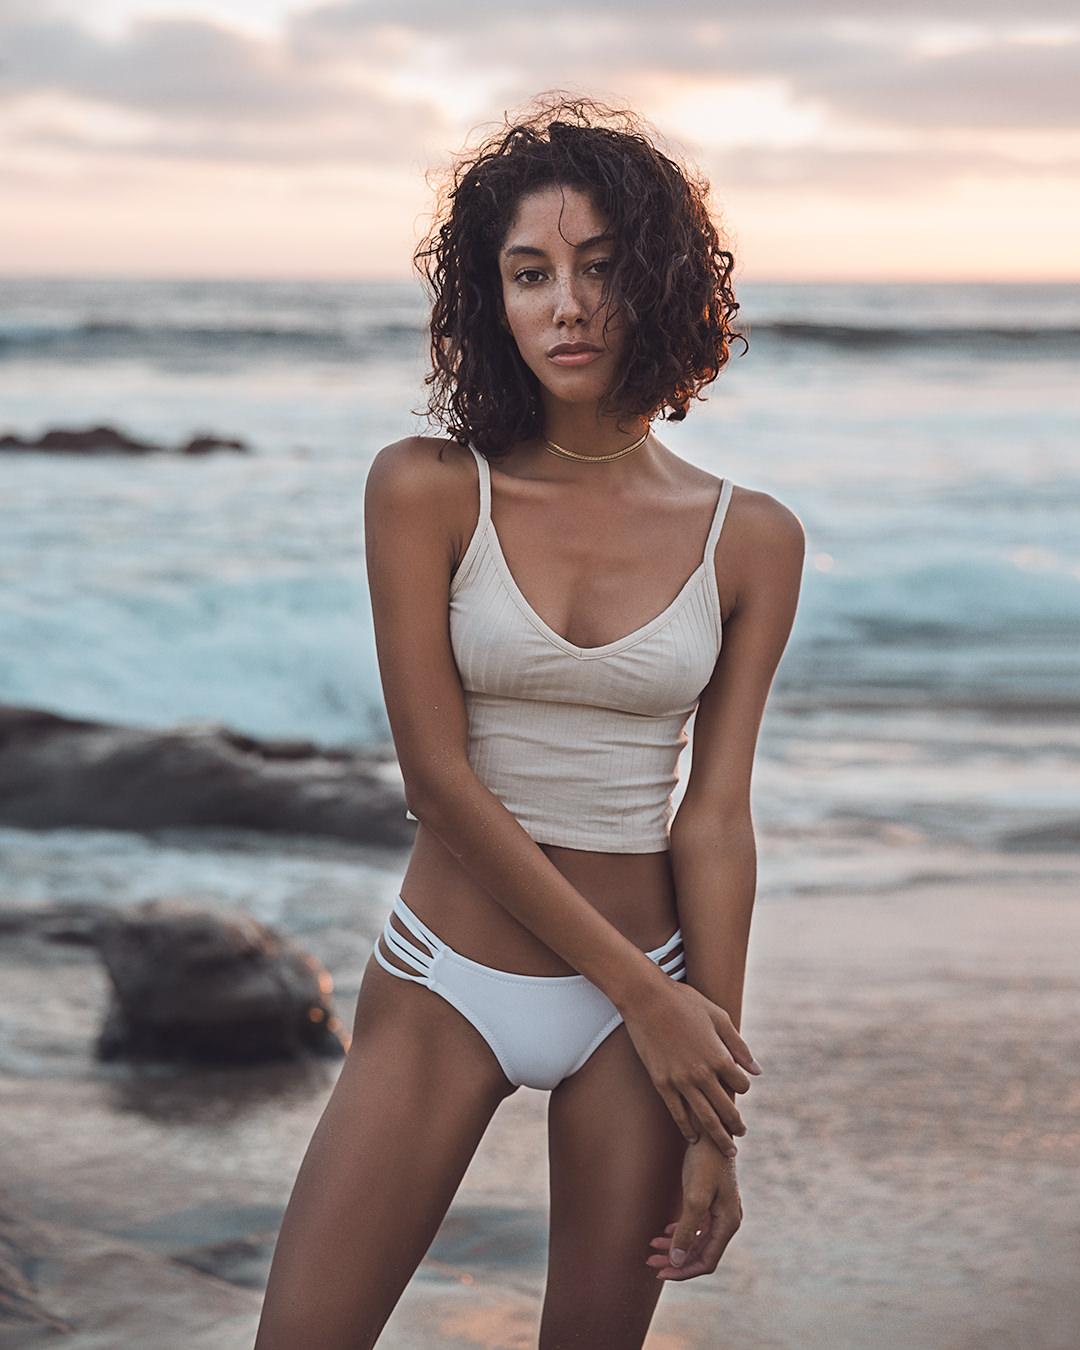 Swamis Beach Bikini Photographer